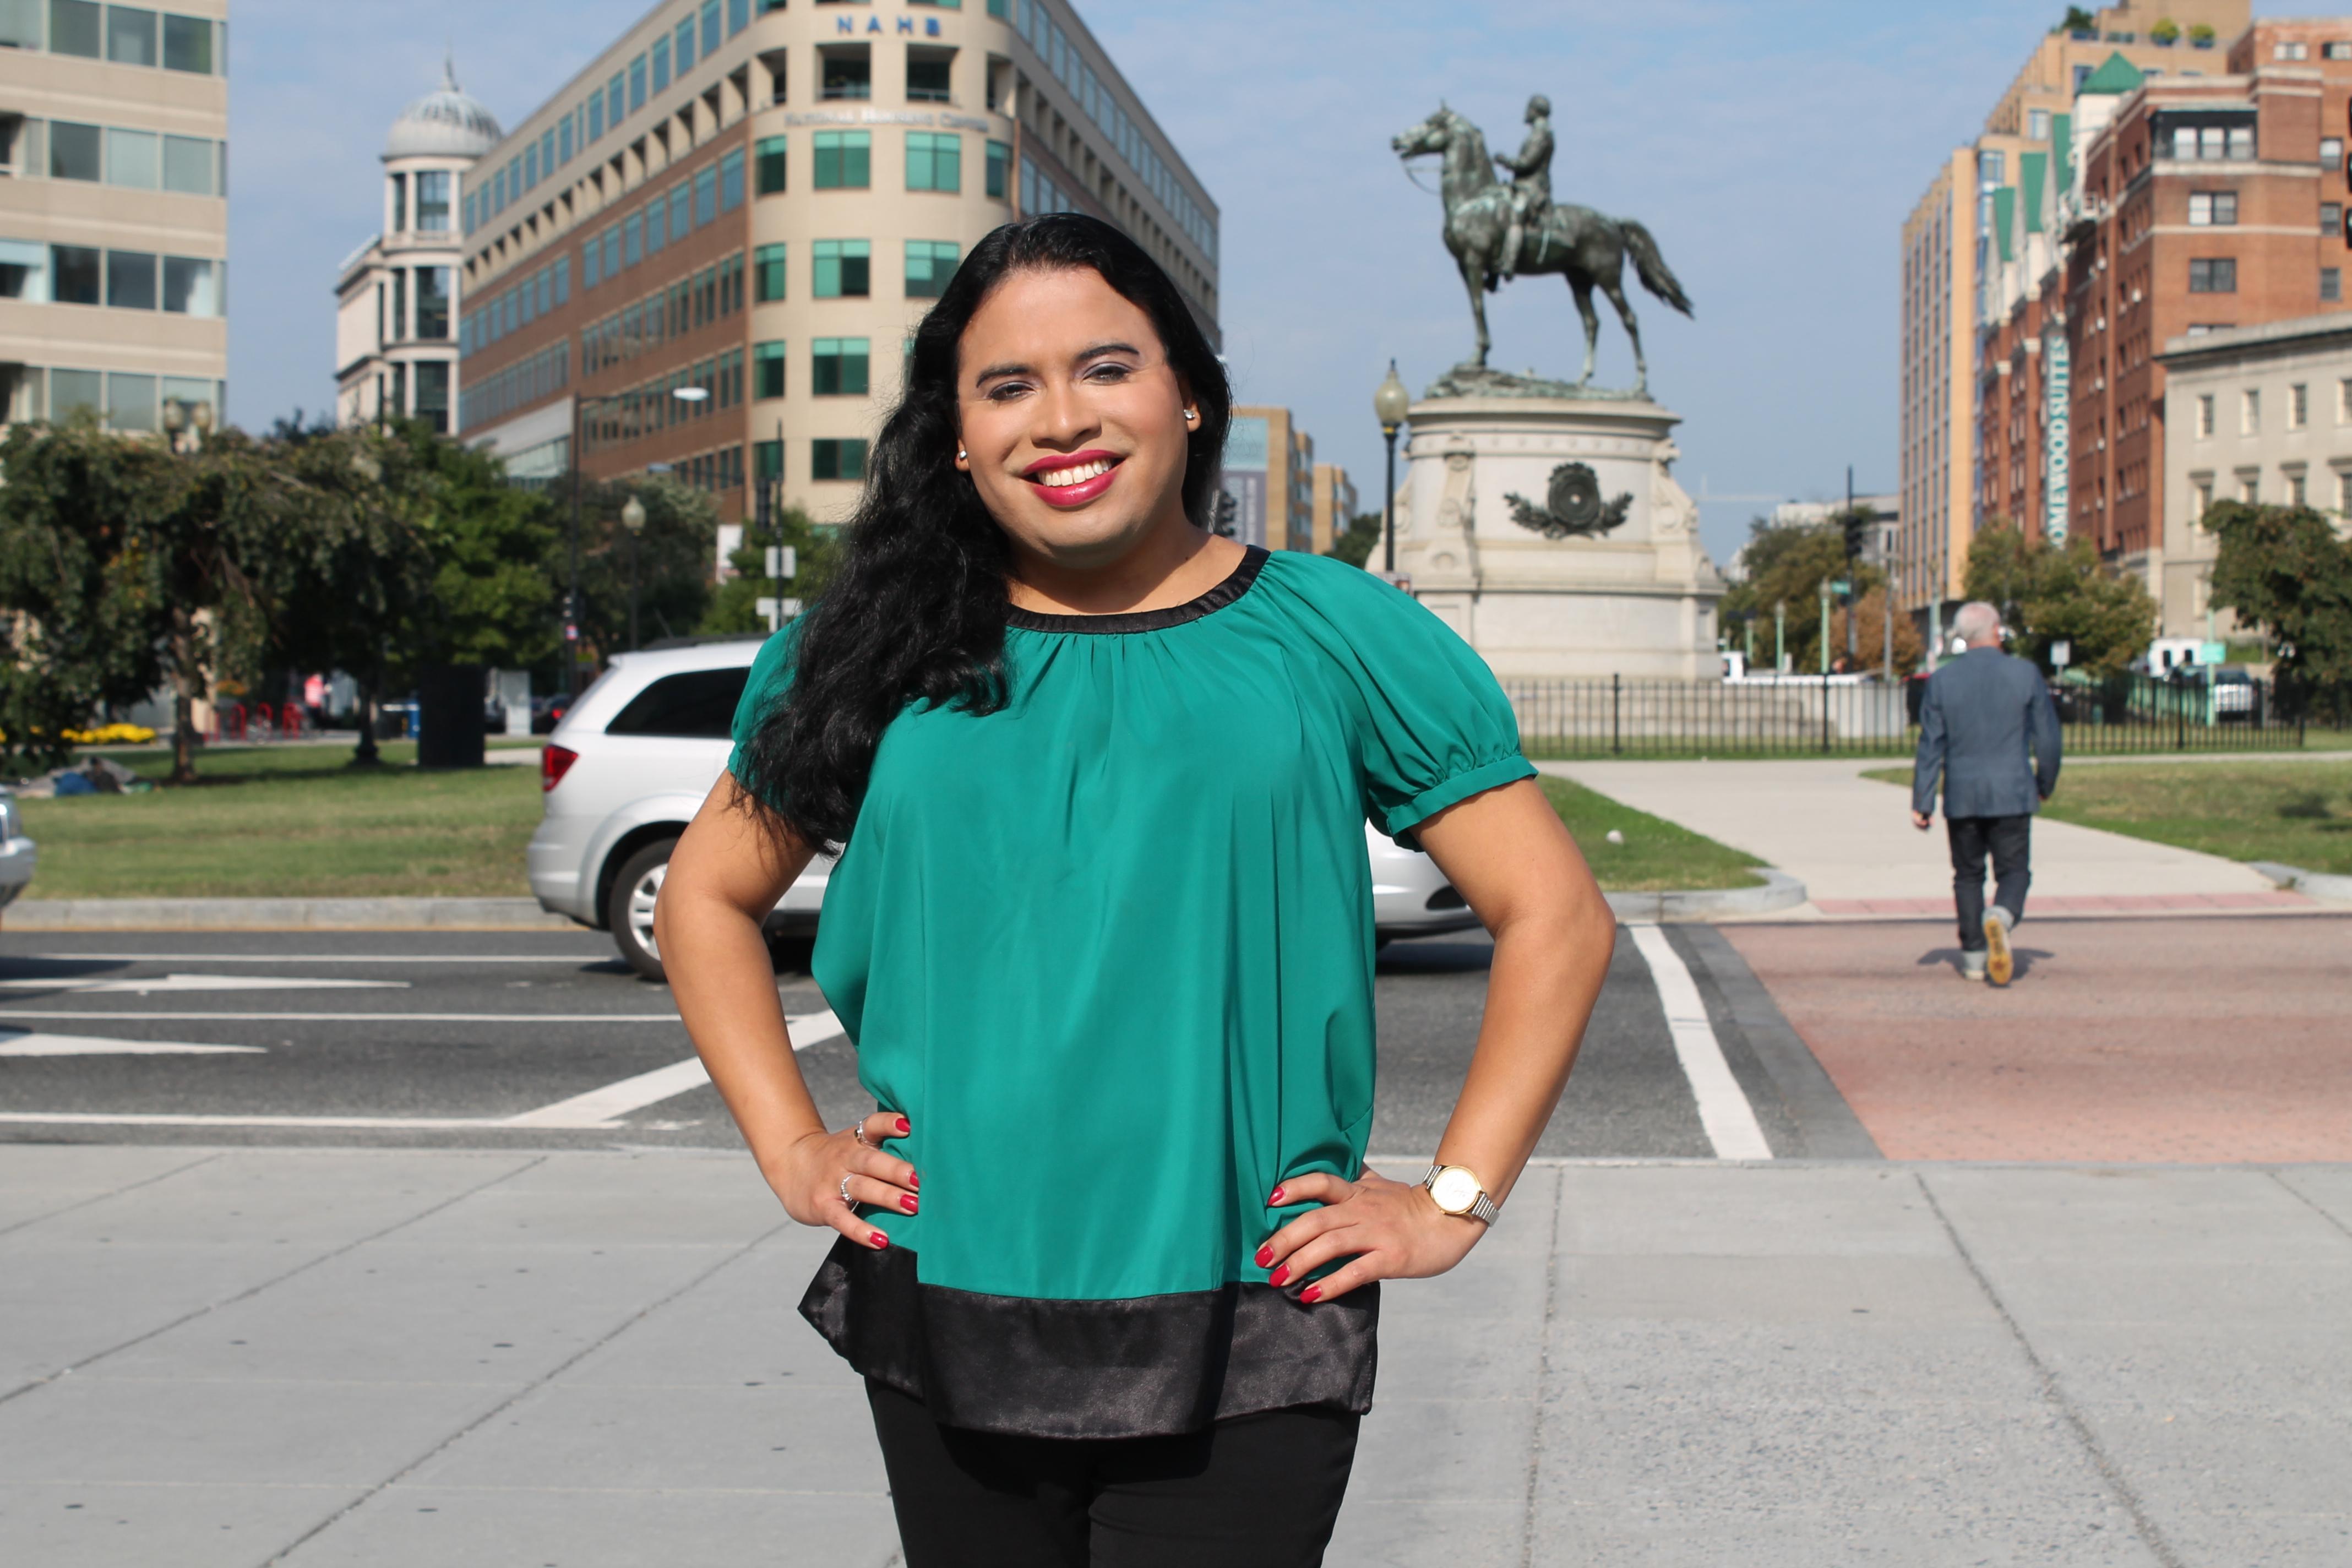 Raffi Freedman-Gurspan, the first openly transgender White House staffer.